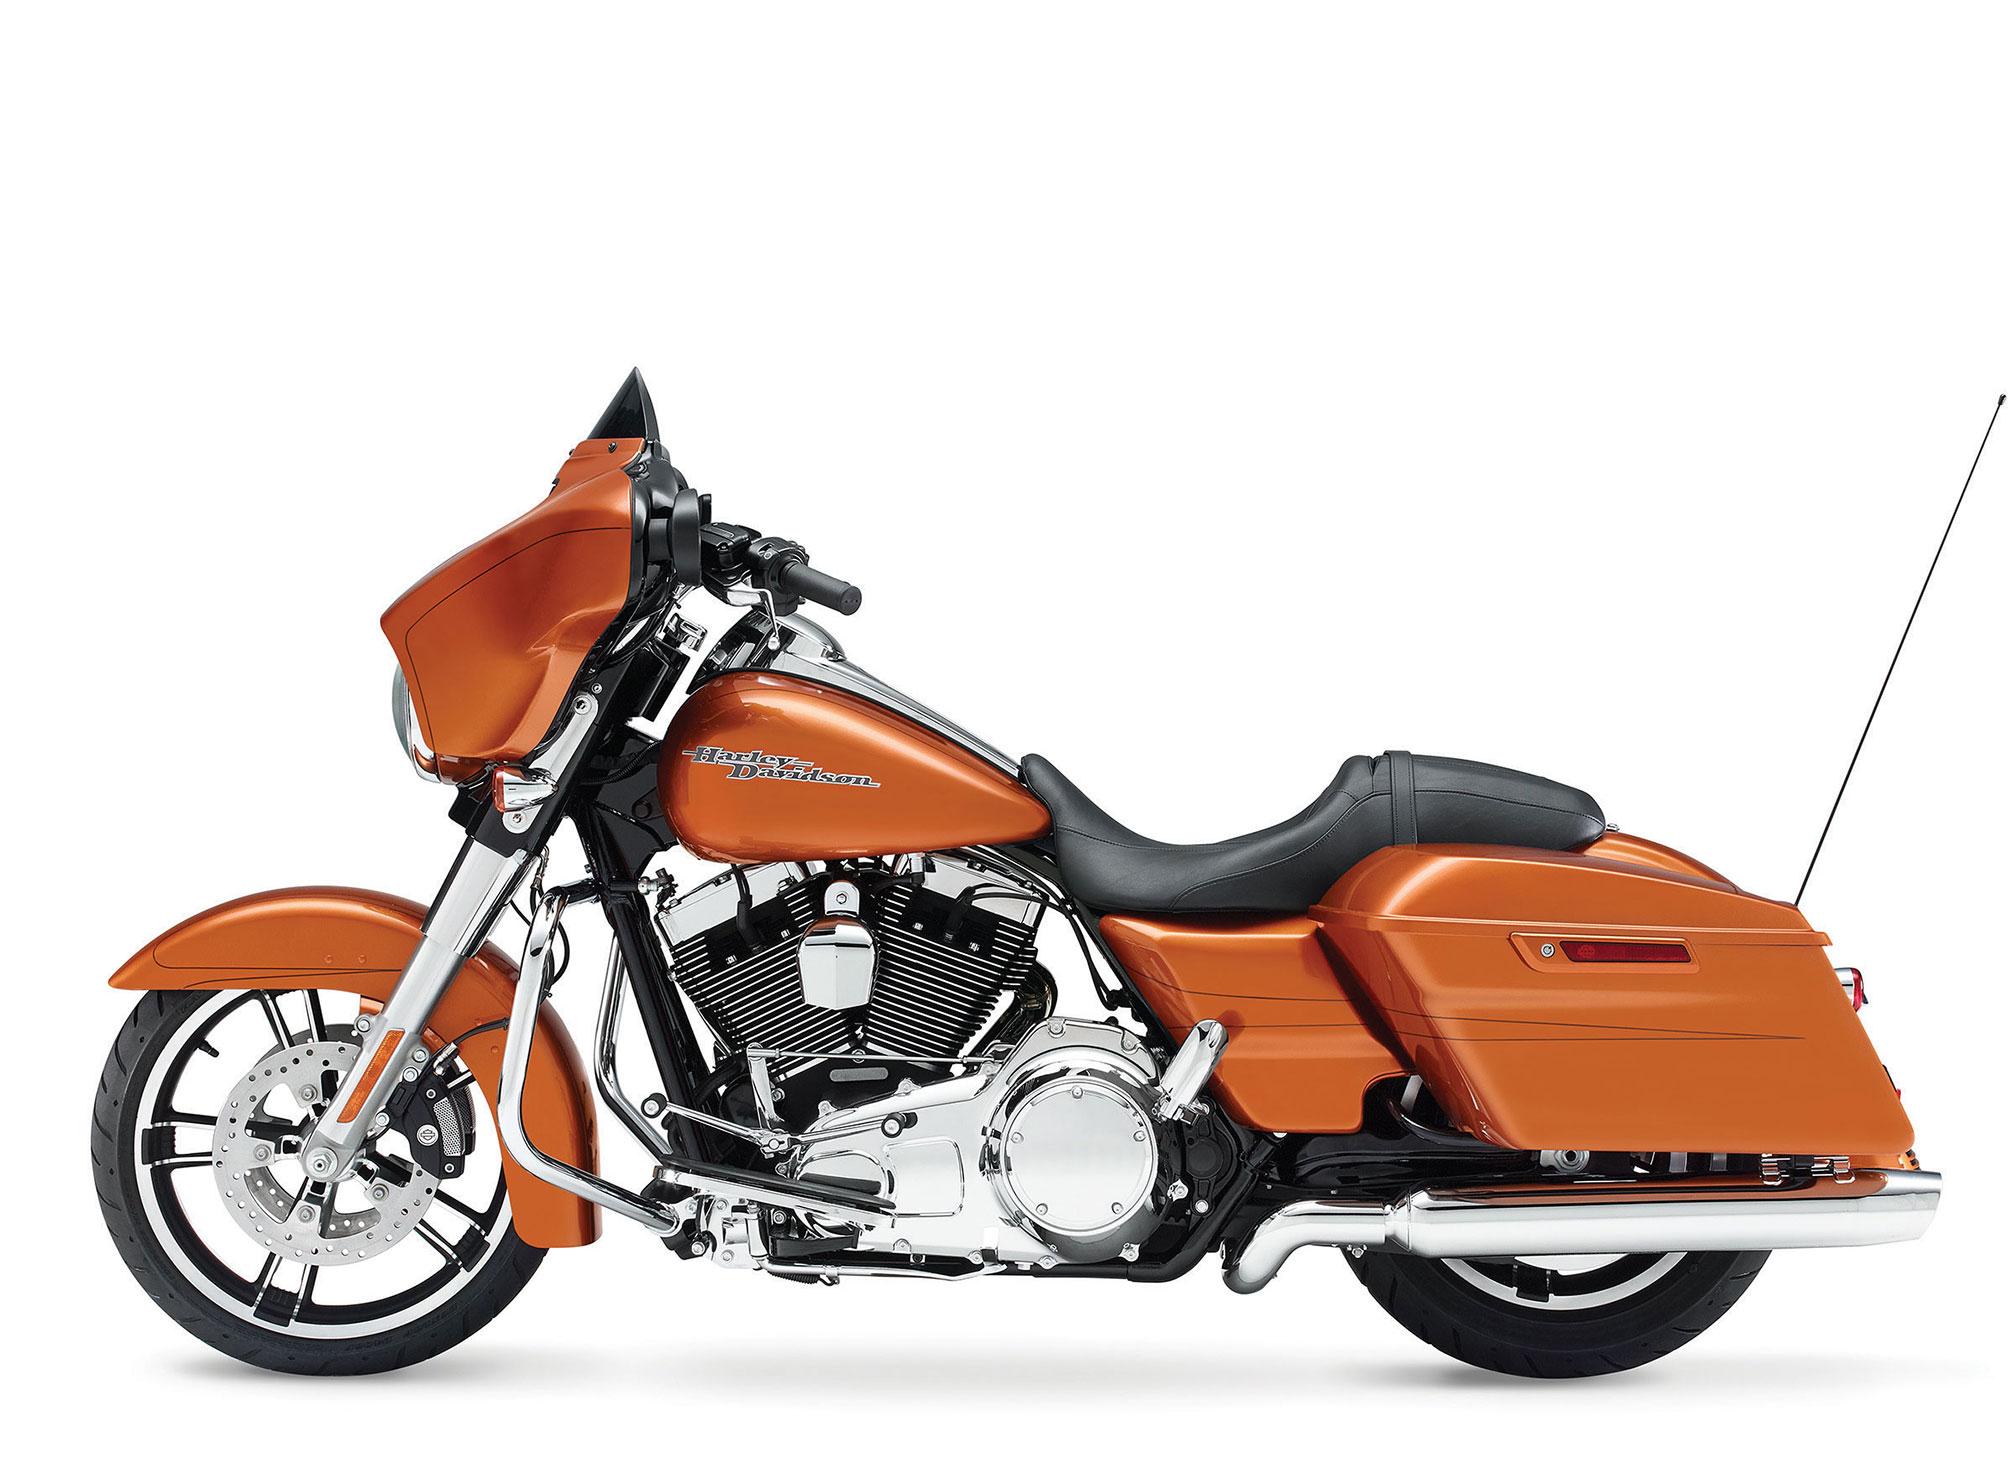 2014 harley davidson flhxs street glide special review rh totalmotorcycle com Harley-Davidson Road King Classic 2015 Harley-Davidson Street Glide Special